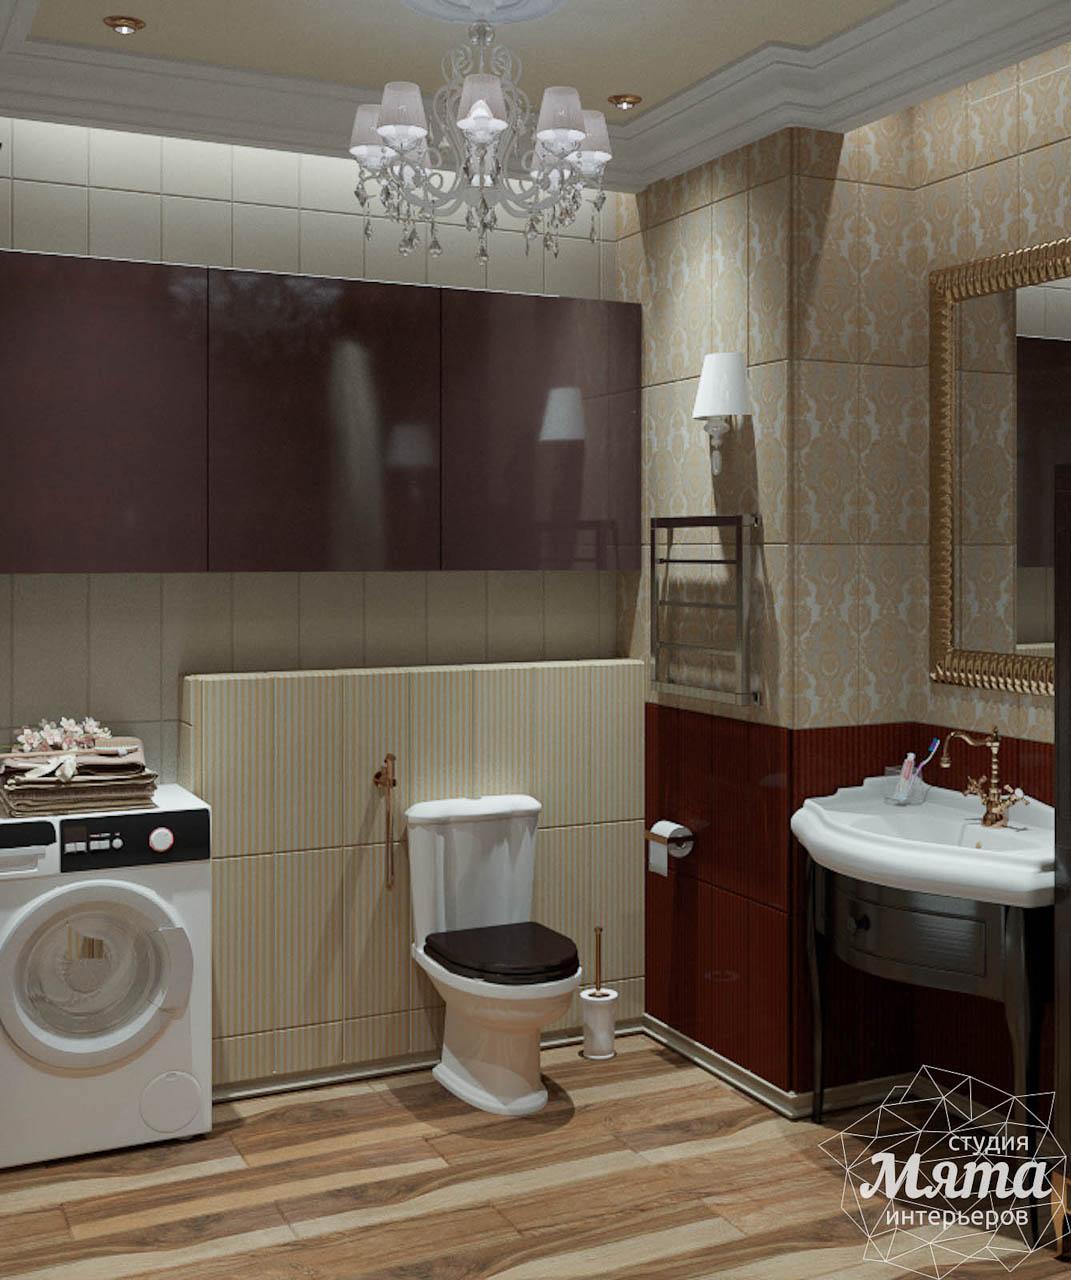 Дизайн интерьера и ремонт трехкомнатной квартиры в Карасьозерском 2 img759393956